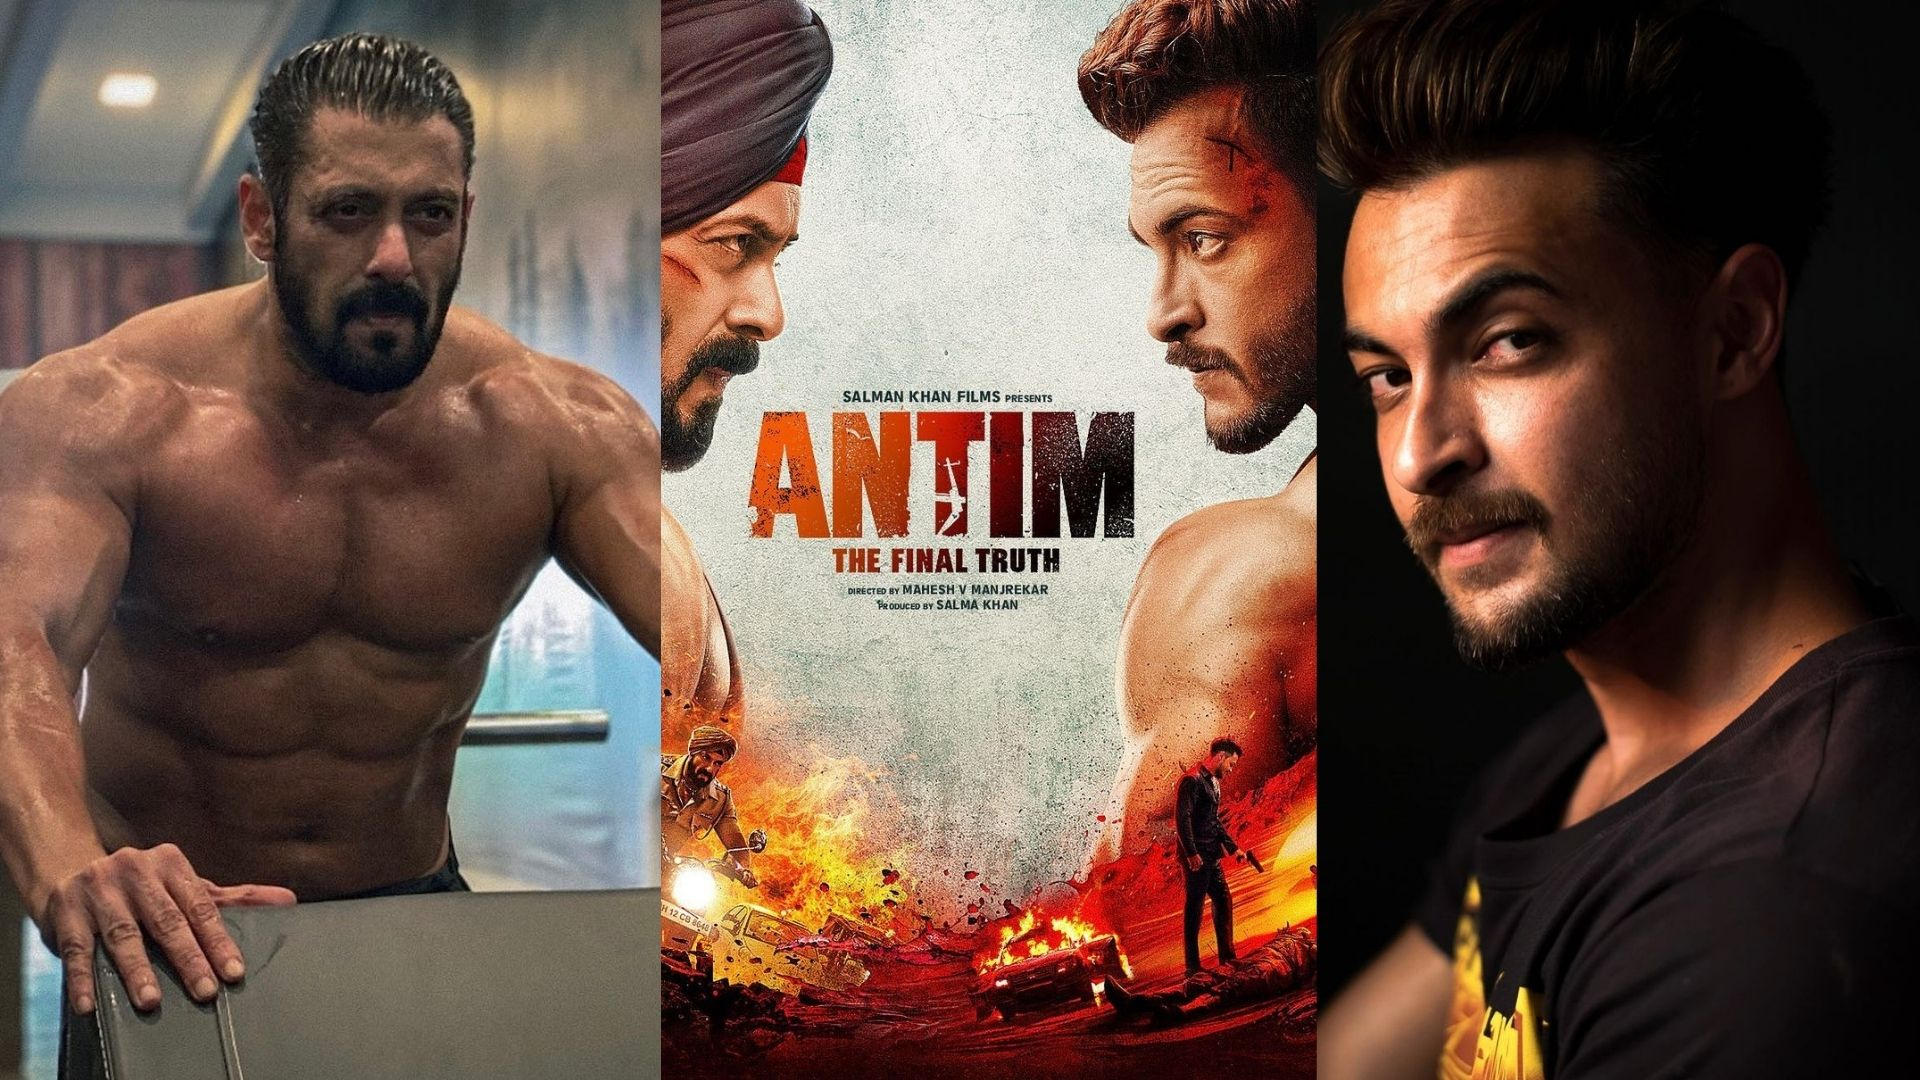 Antim: Salman Khan And Aayush Sharma Starrer Action Film's Trailer To Arrive Next Week – Report